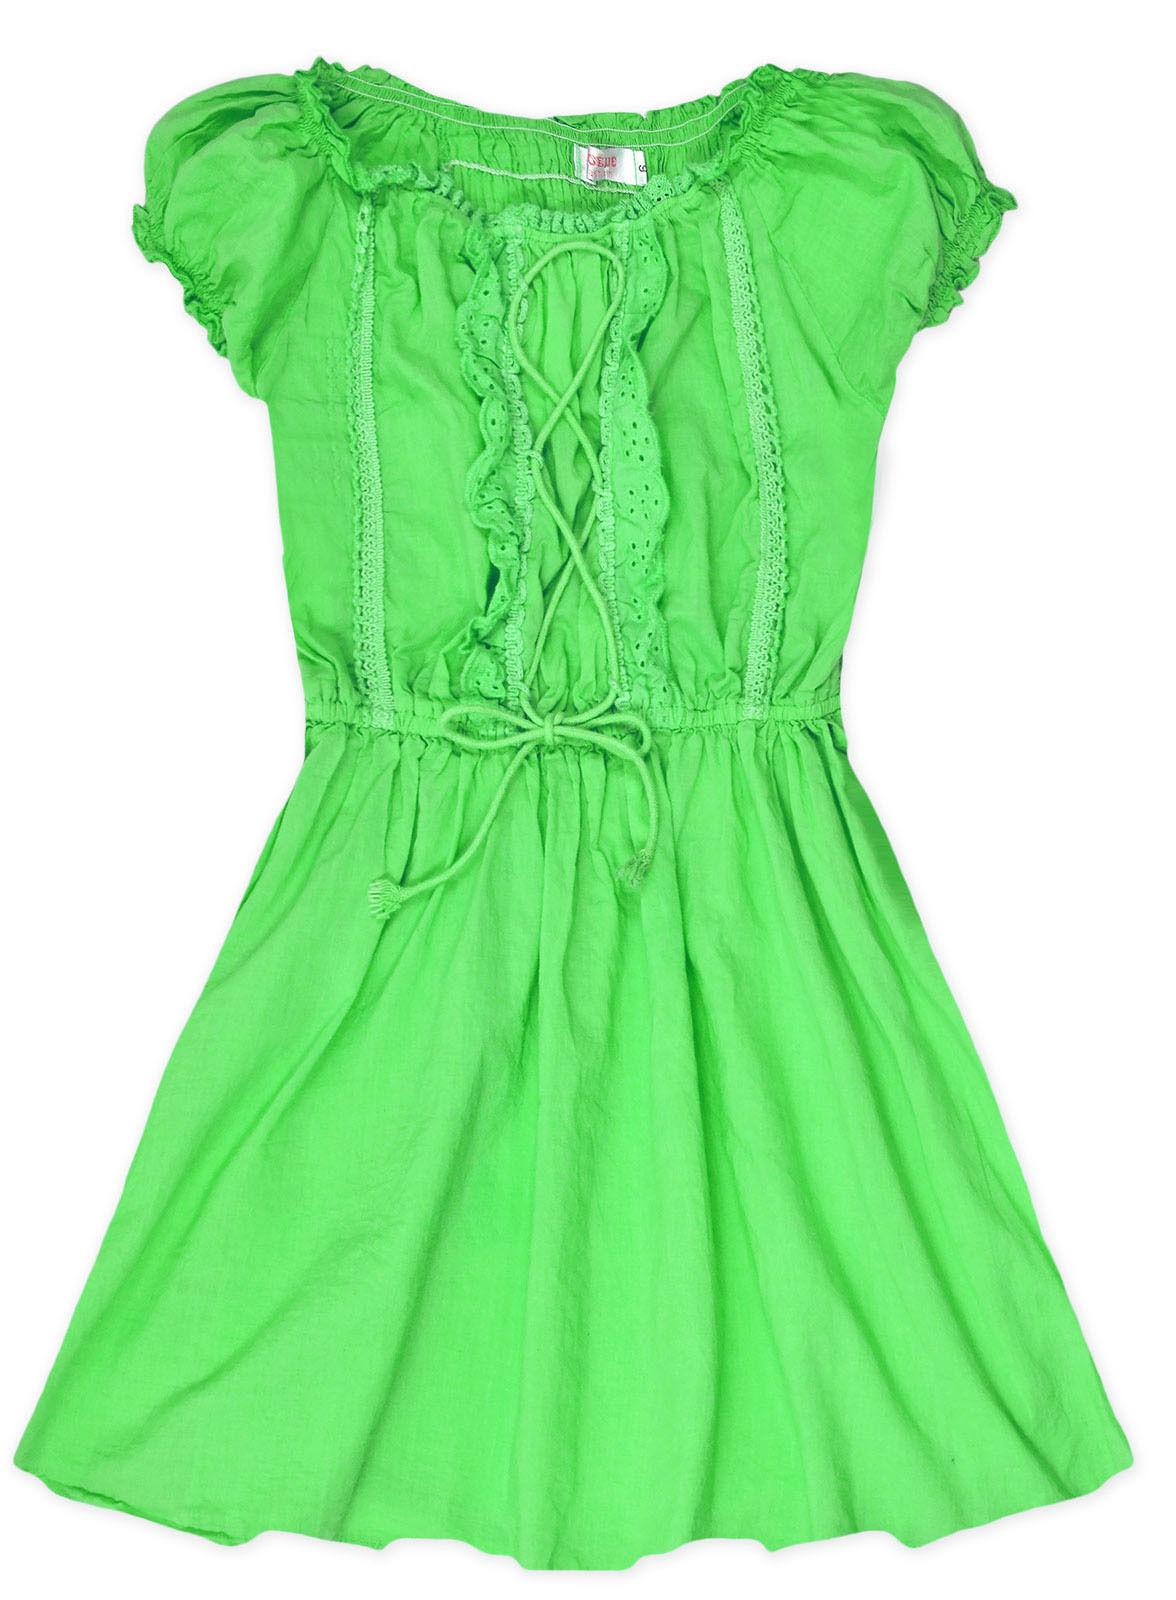 Girls Short Sleeved Gypsy Dress Frill Neck Kids Dresses New Age 3 4 5 6 7 8 Year